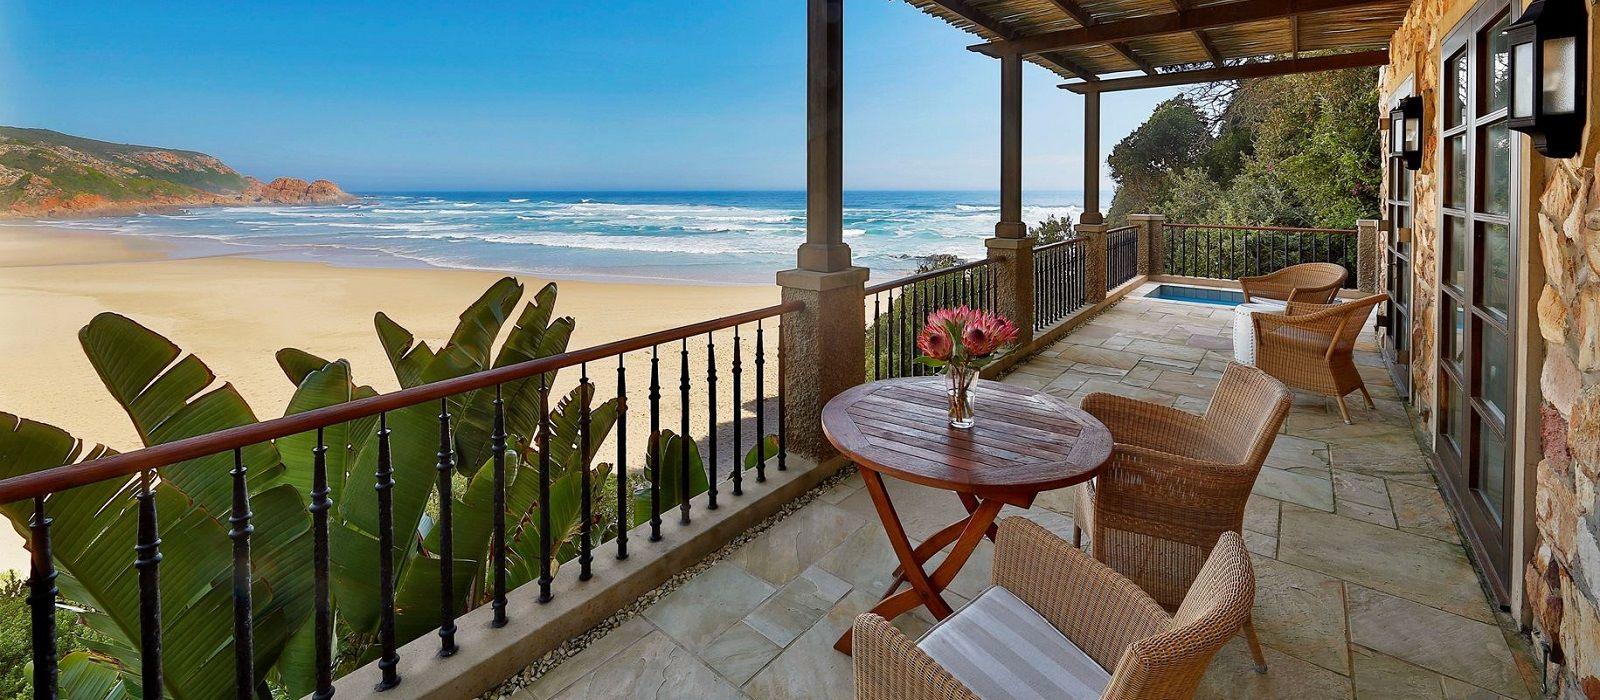 Hotel Pezula Spa & Gym South Africa